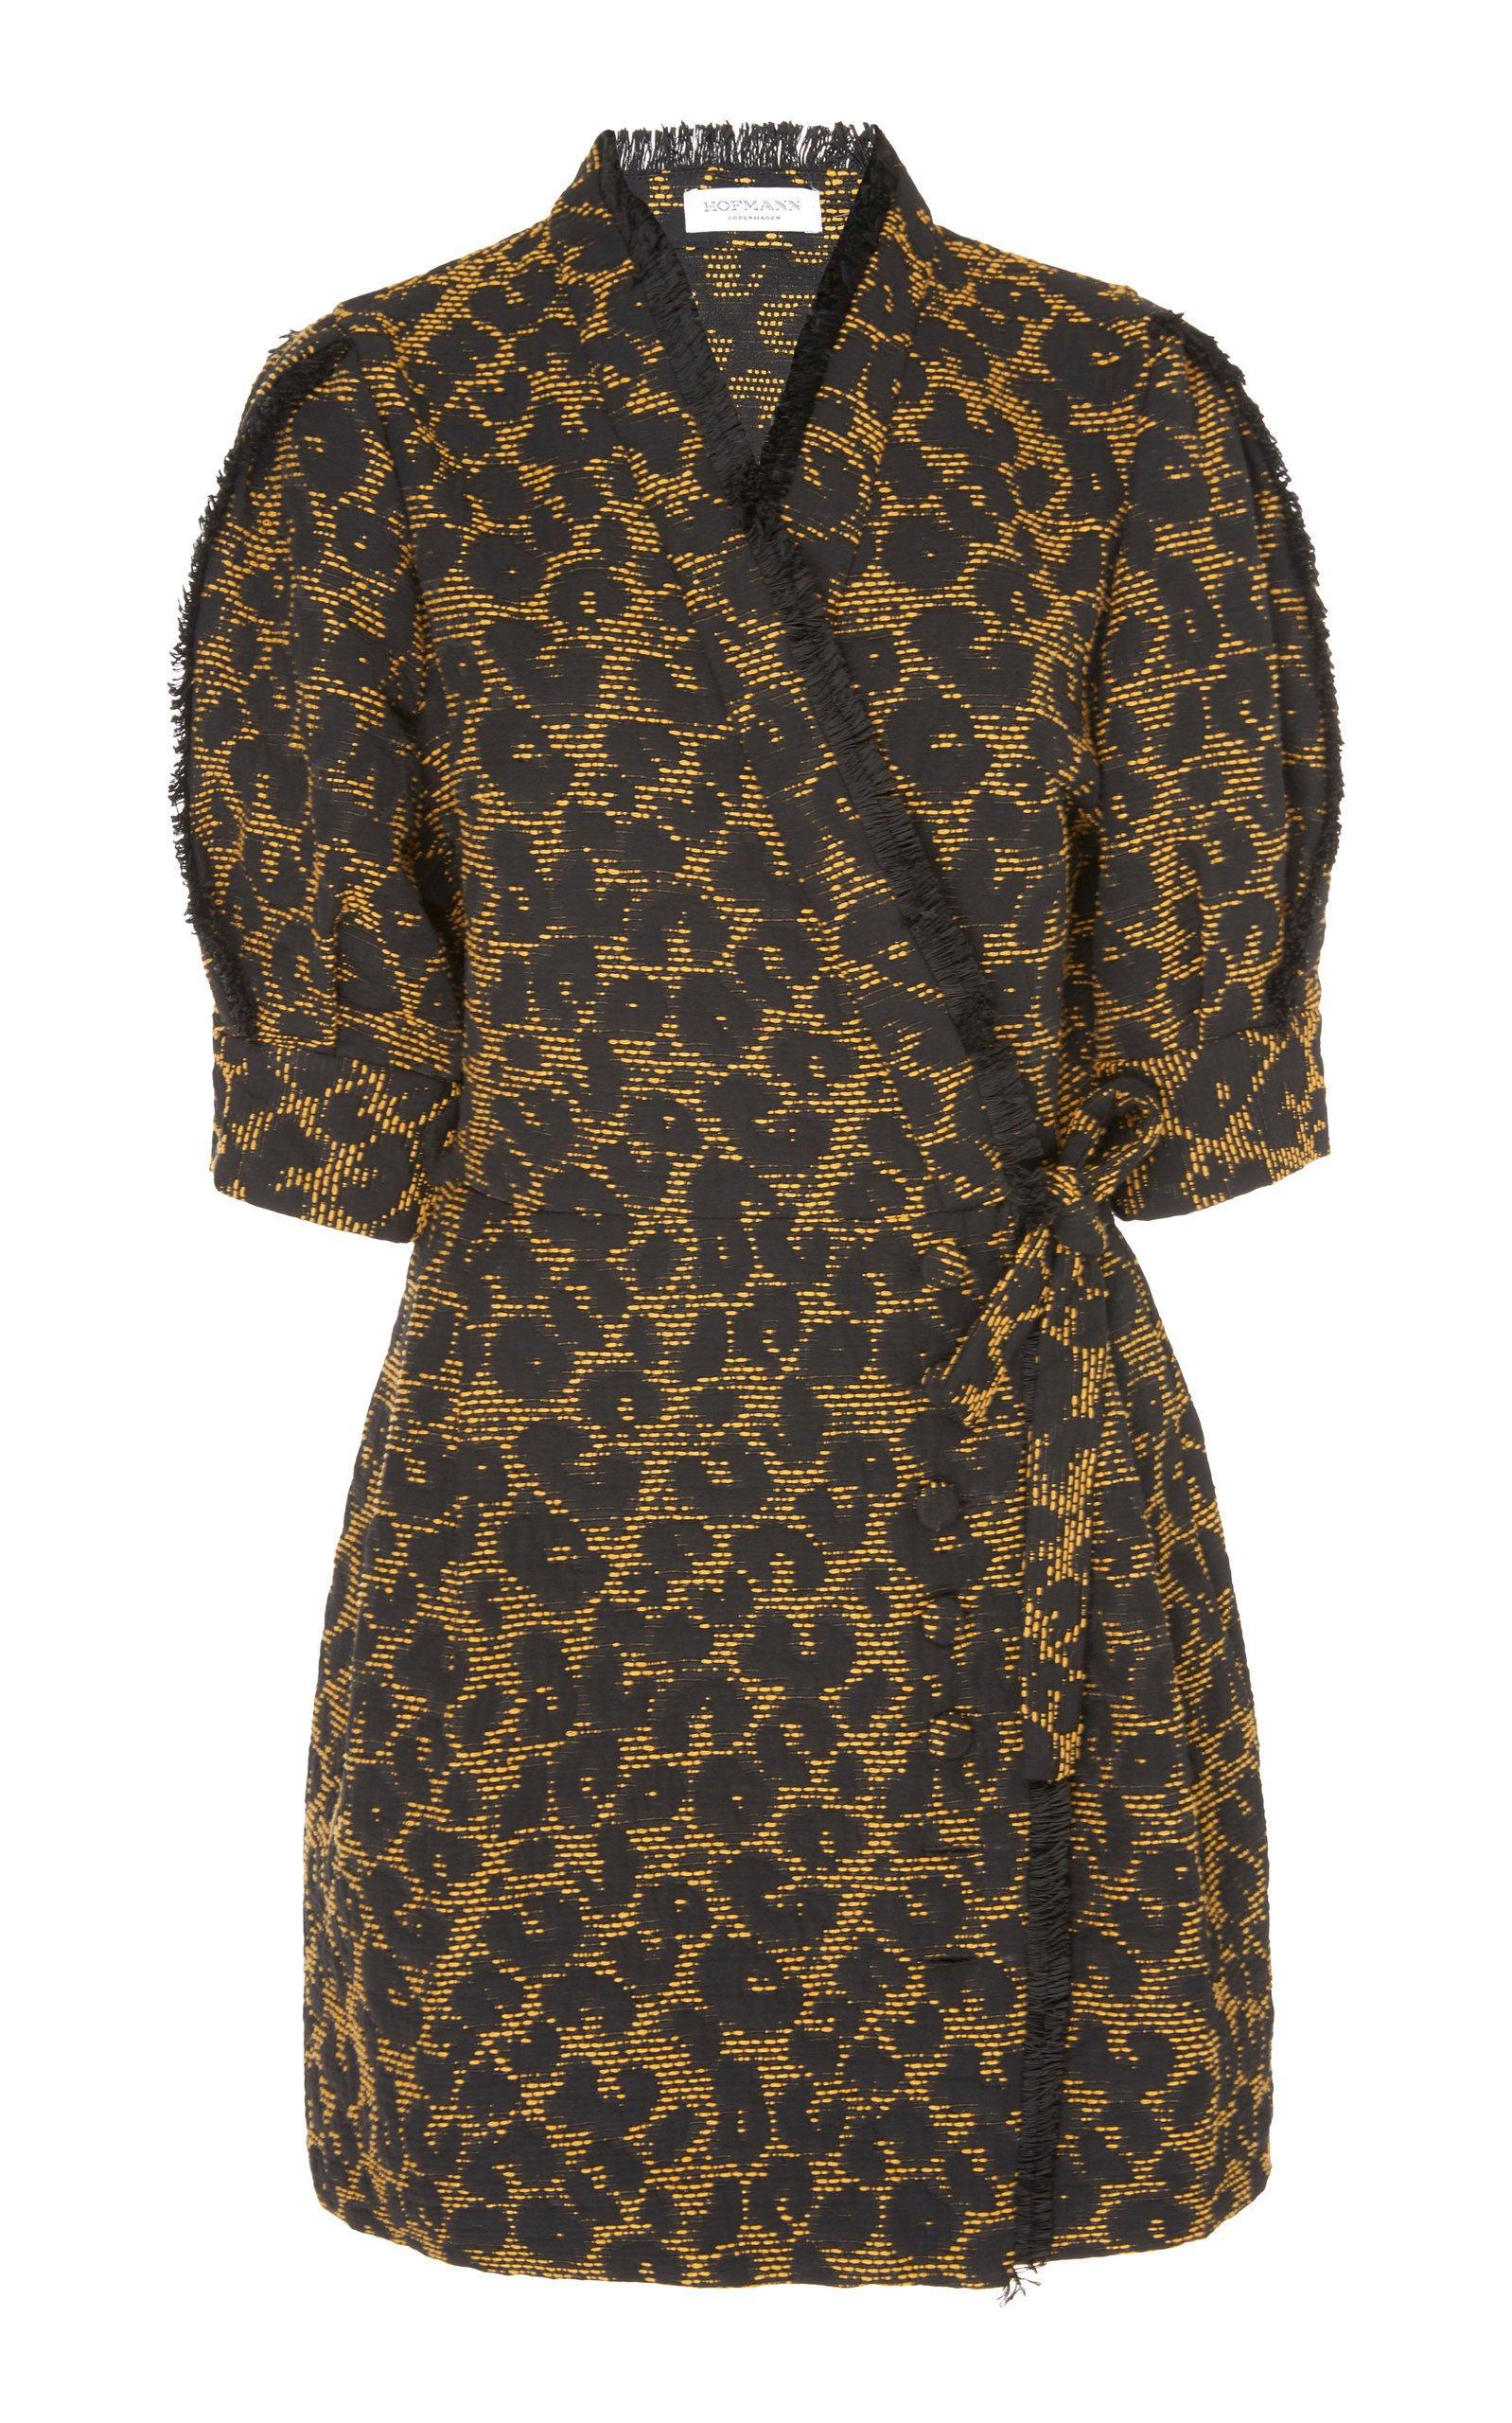 HOFMANN COPENHAGEN Kristen Puff Sleeve Mini Dress